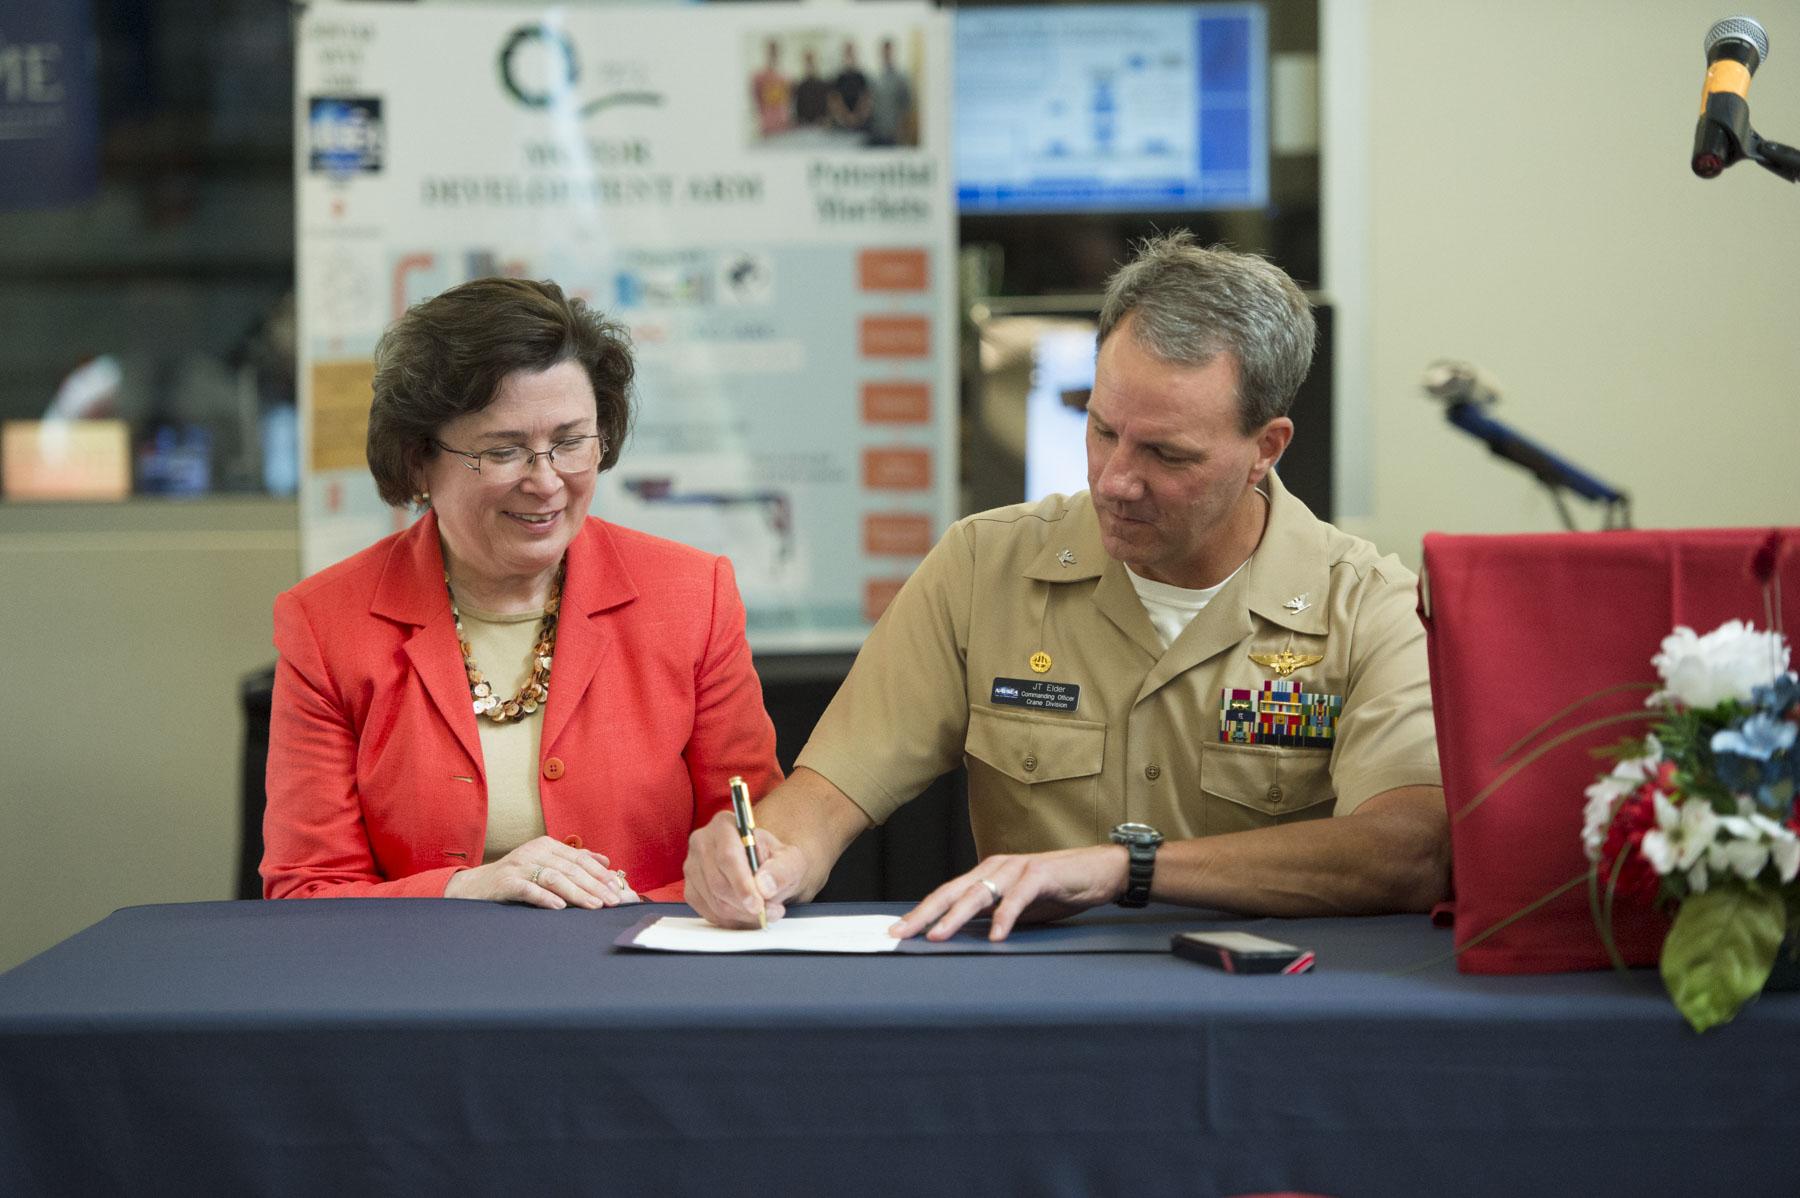 Nswc Crane Usi Continue Strong Partnership Through Intermediary